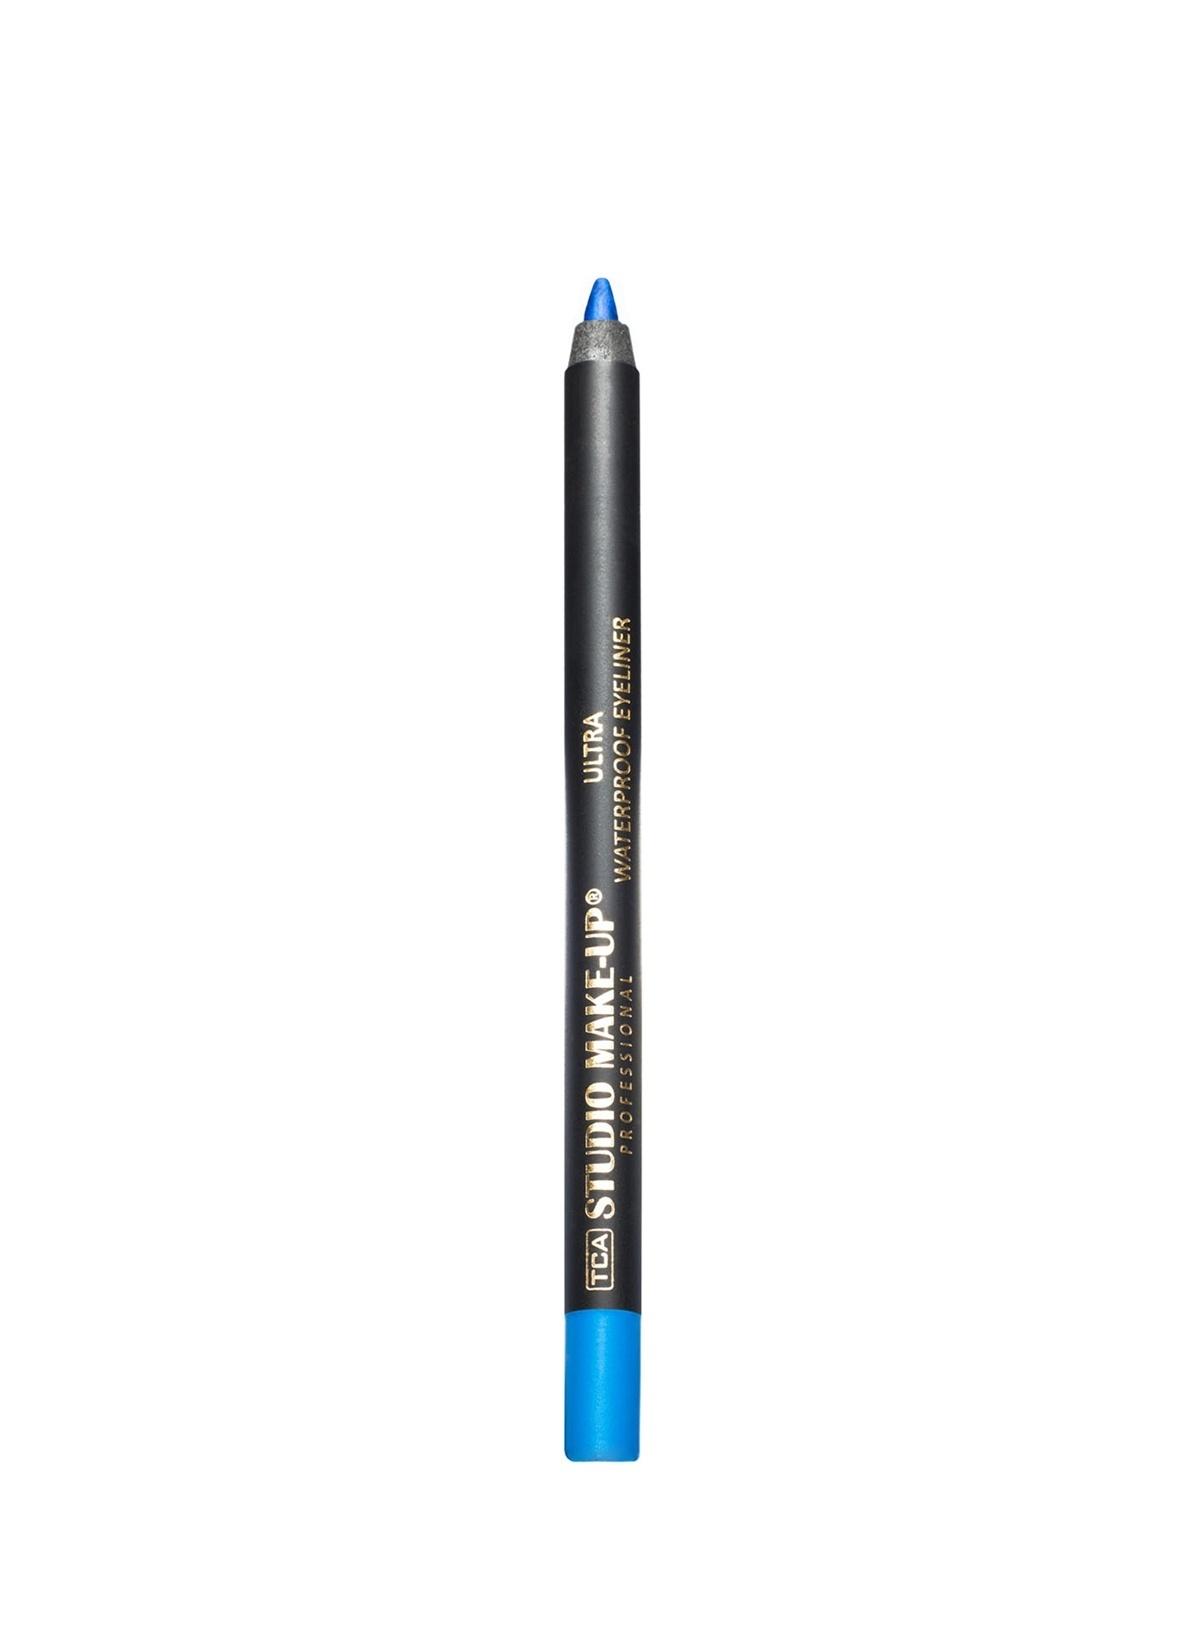 Tca Studio Make Up Ultrawaterproof Eyeliner 808 Dark Blue Tca Studıo Make-up Ultrawaterproof Eyelı – 9.99 TL